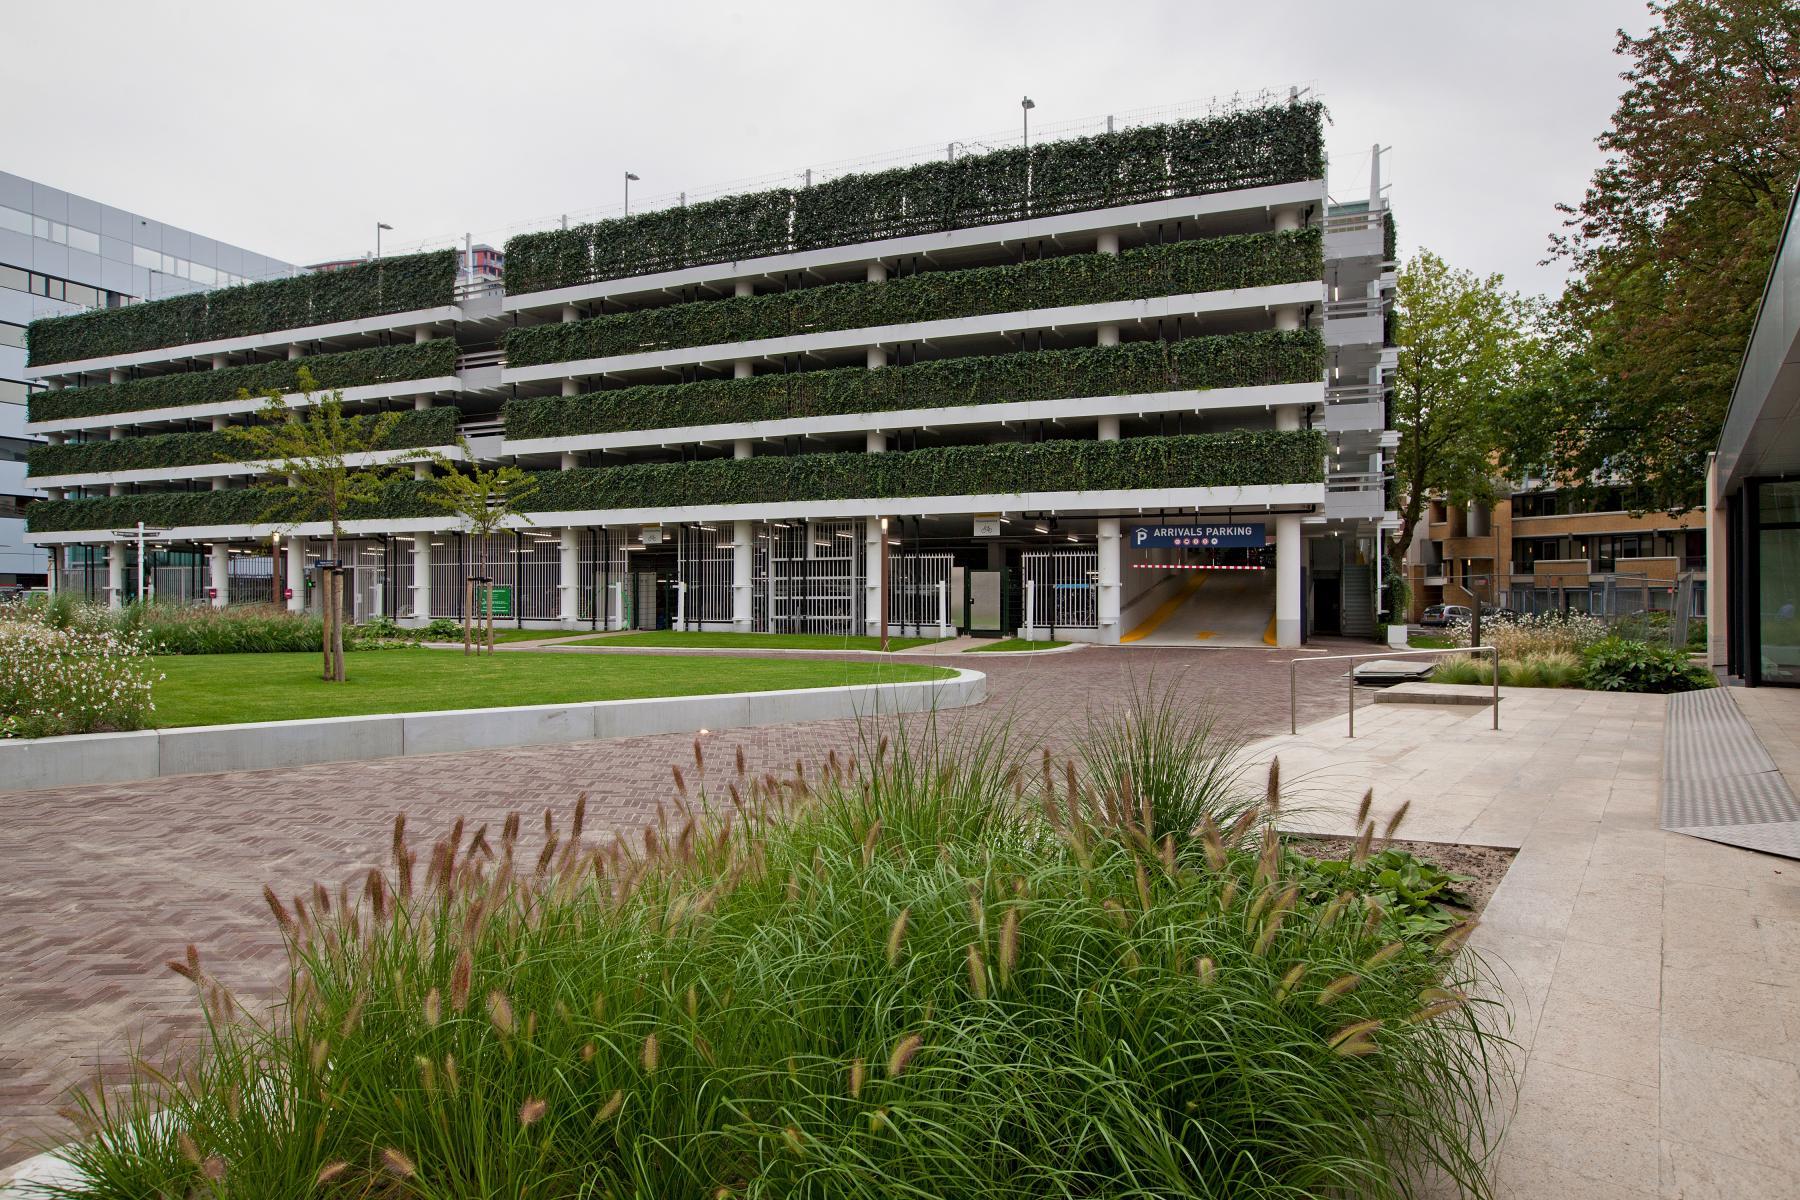 buitenkant kantoorgebouw Rotterdam Kruisplein  met gratis wifi